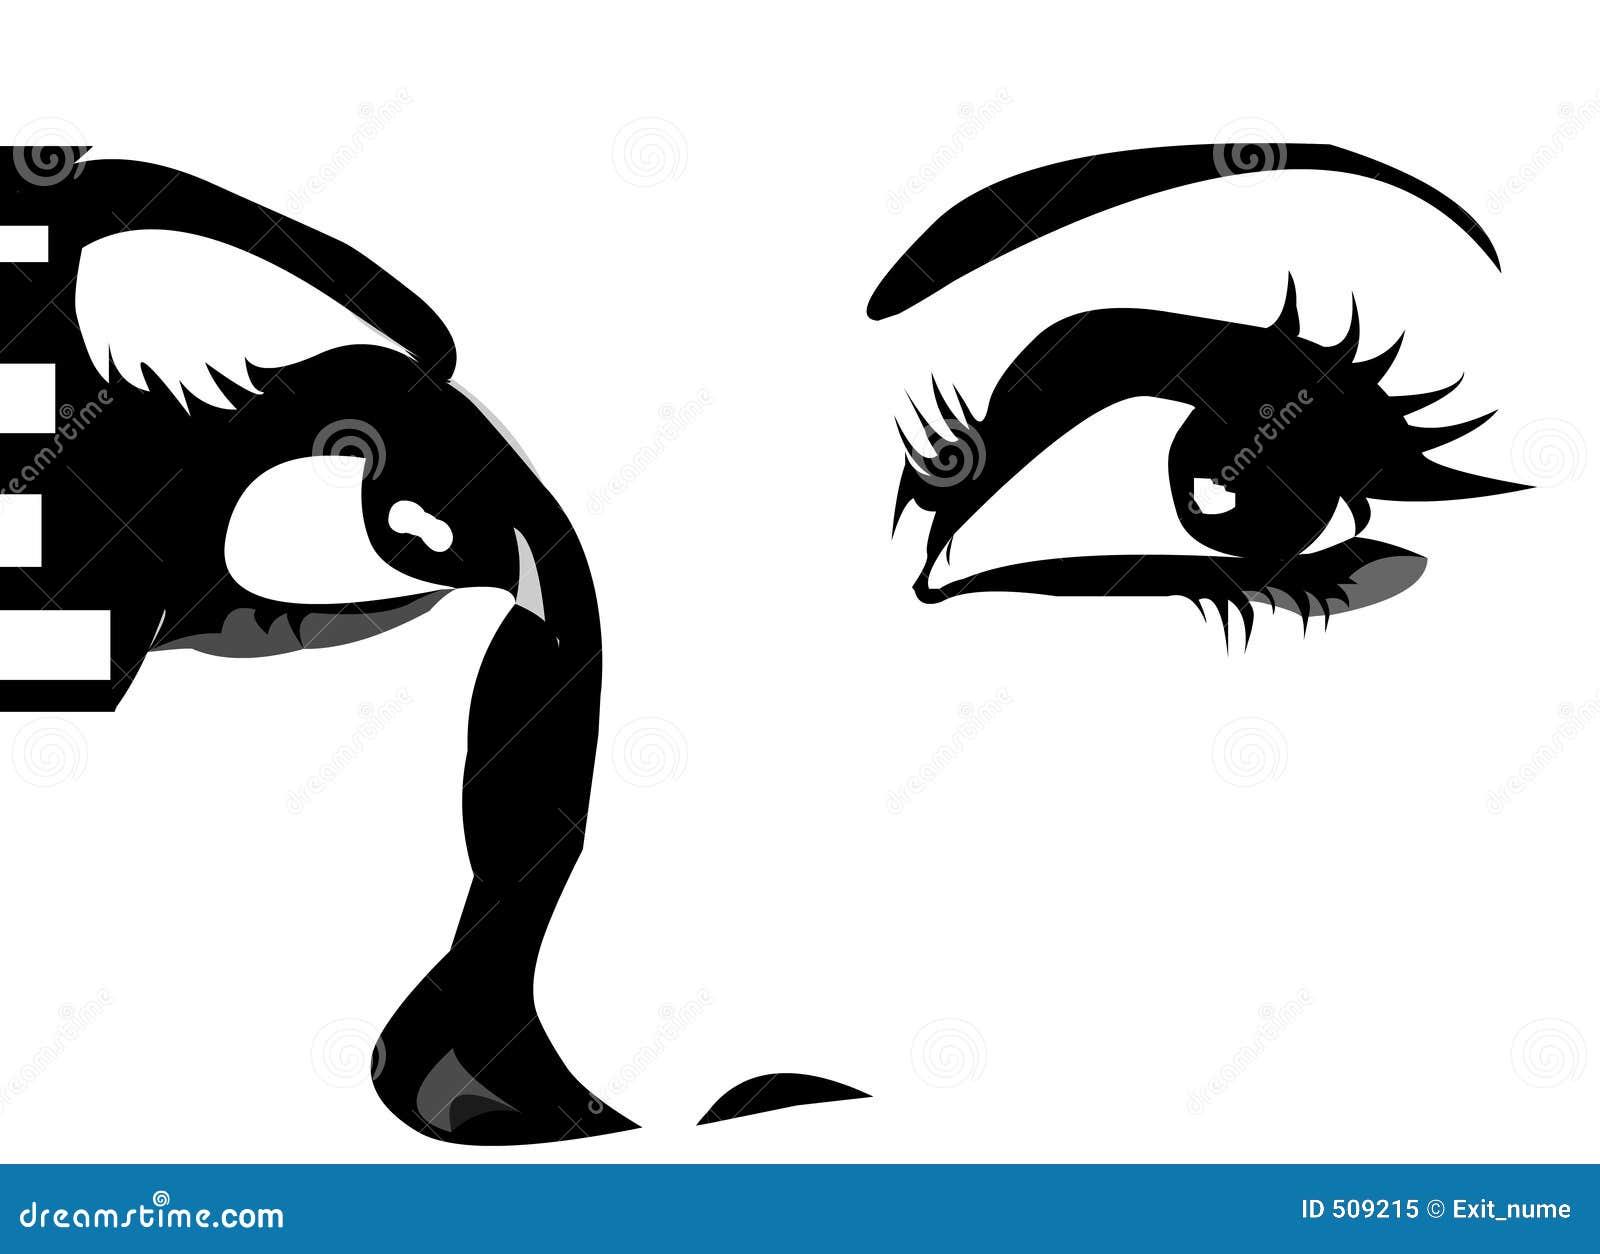 Graphic Eyes Looking Up Stock Illustration Of Make Rh Dreamstime Com Anime Cartoon Upward